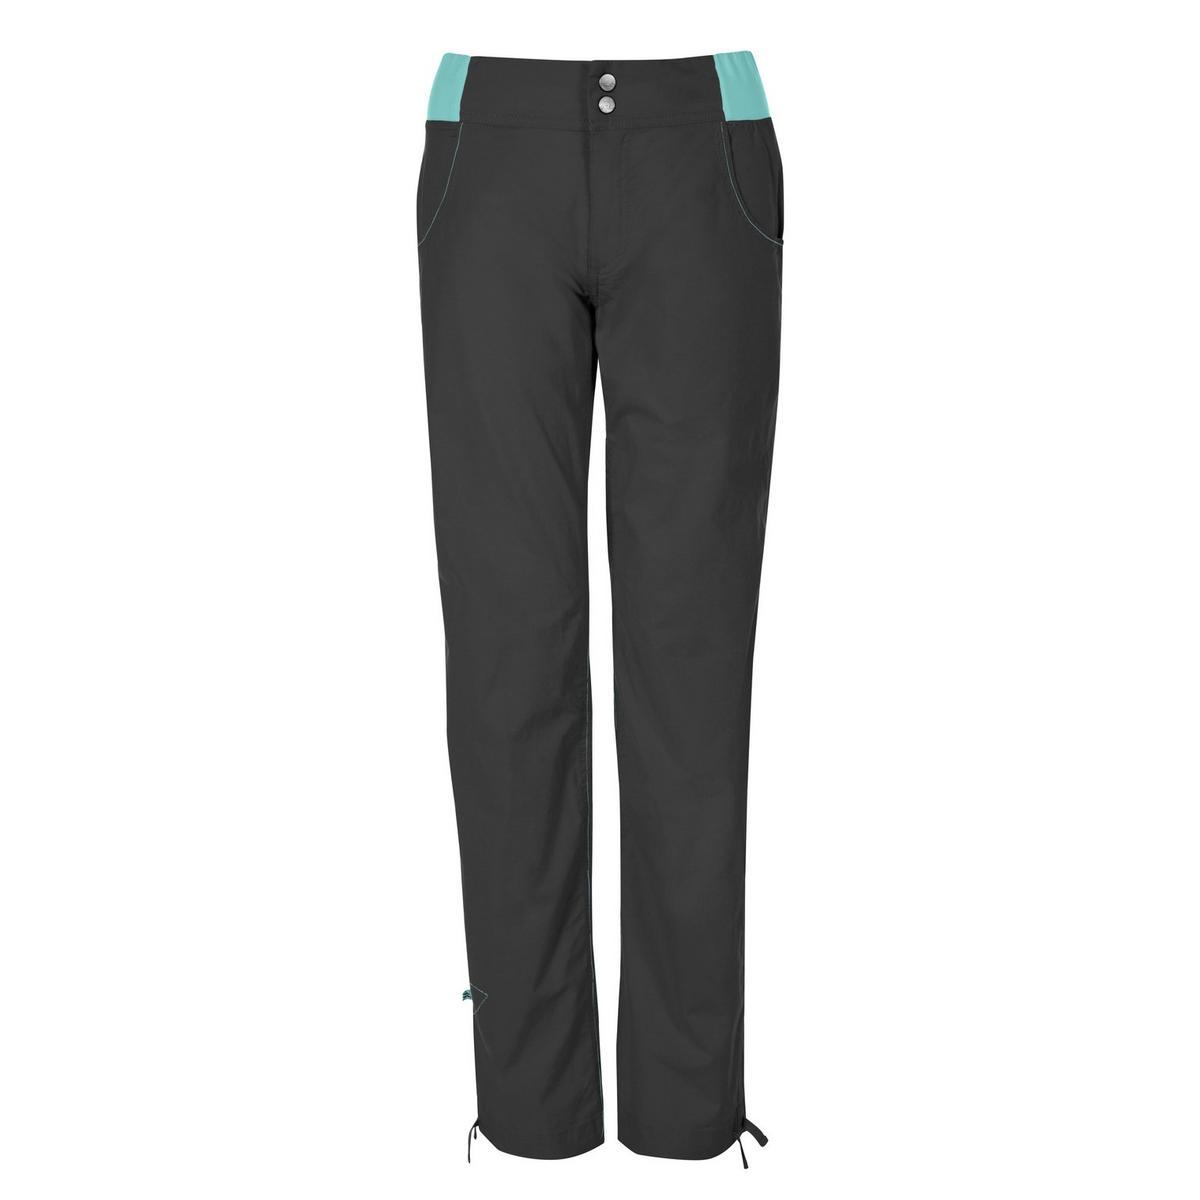 Rab Women's Rab Valkyrie Pants - Grey